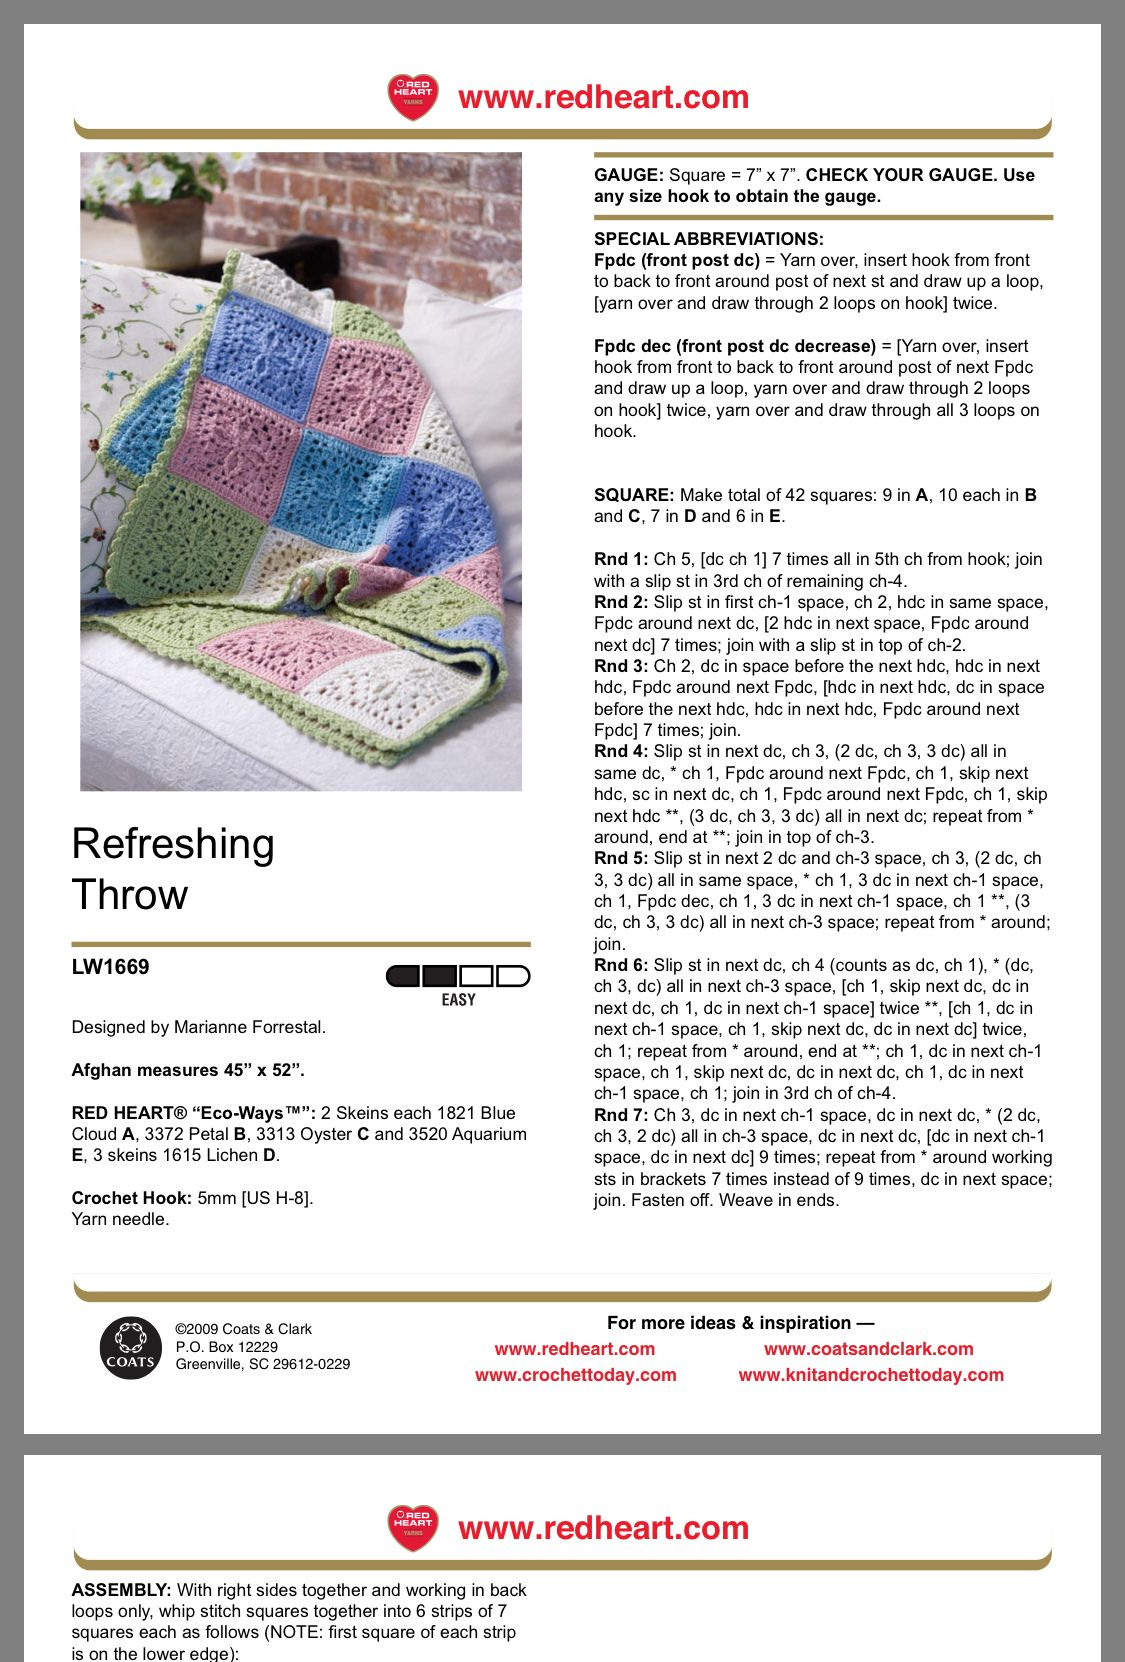 Pin by Virginia Garcia on Crochett   Pinterest